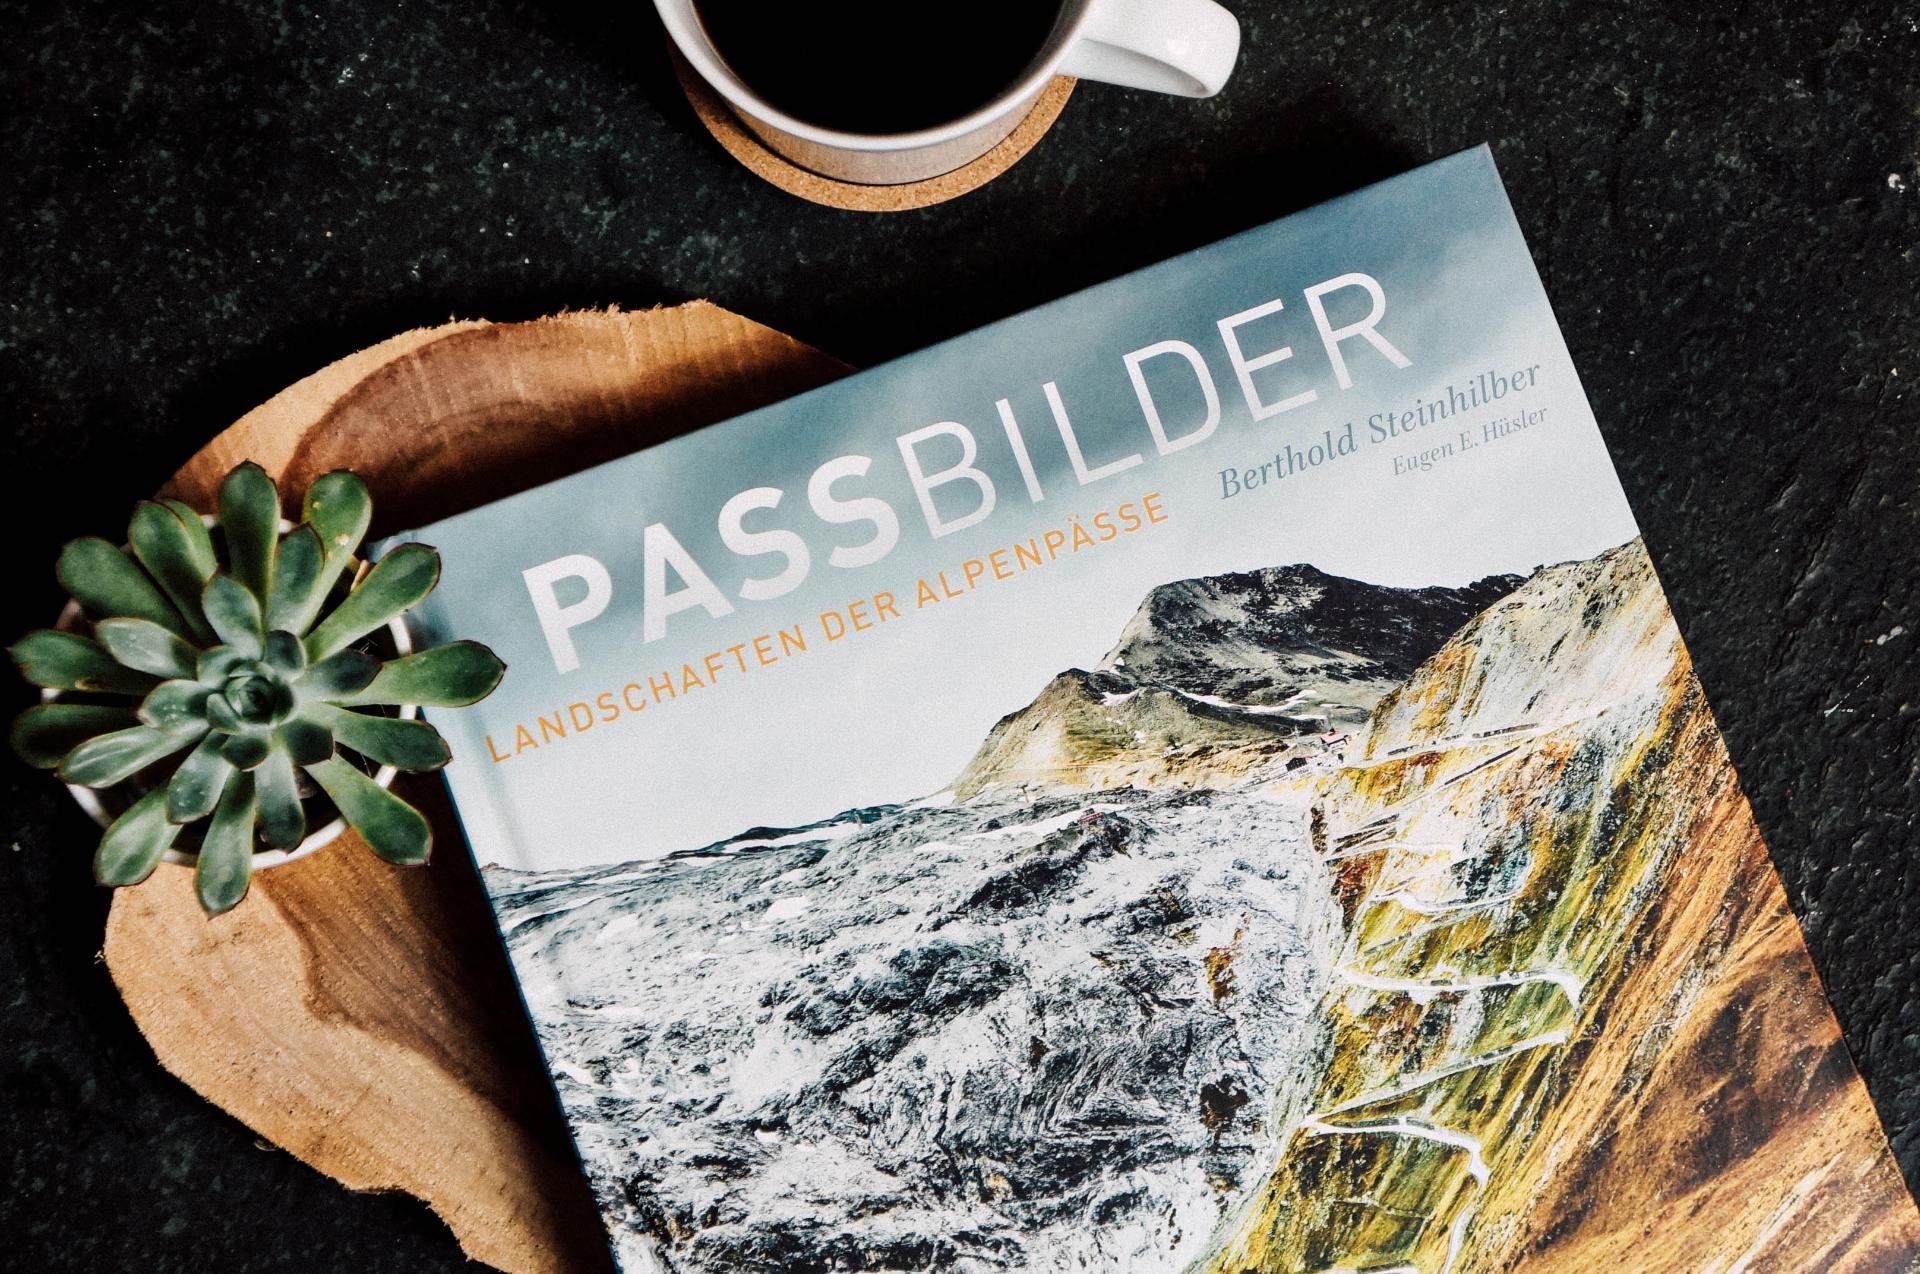 Passbilder Das Buch Alpen